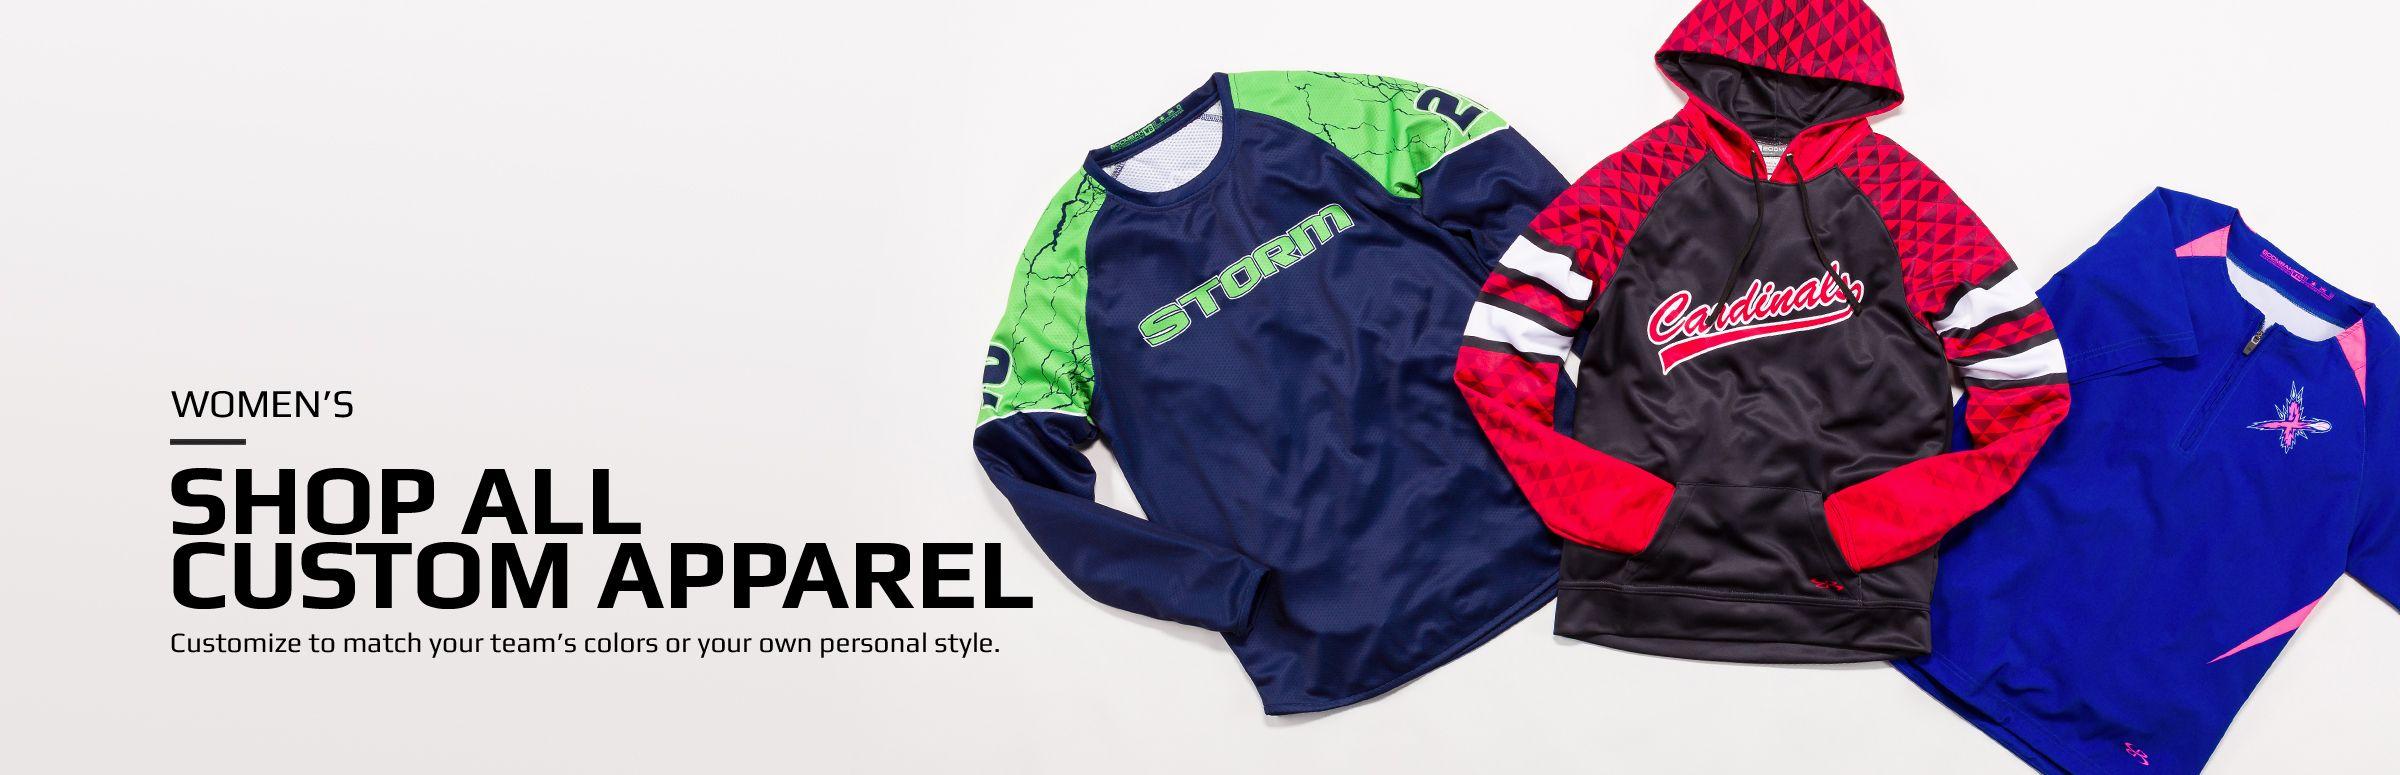 Boombah Custom Apparel - Custom Labs